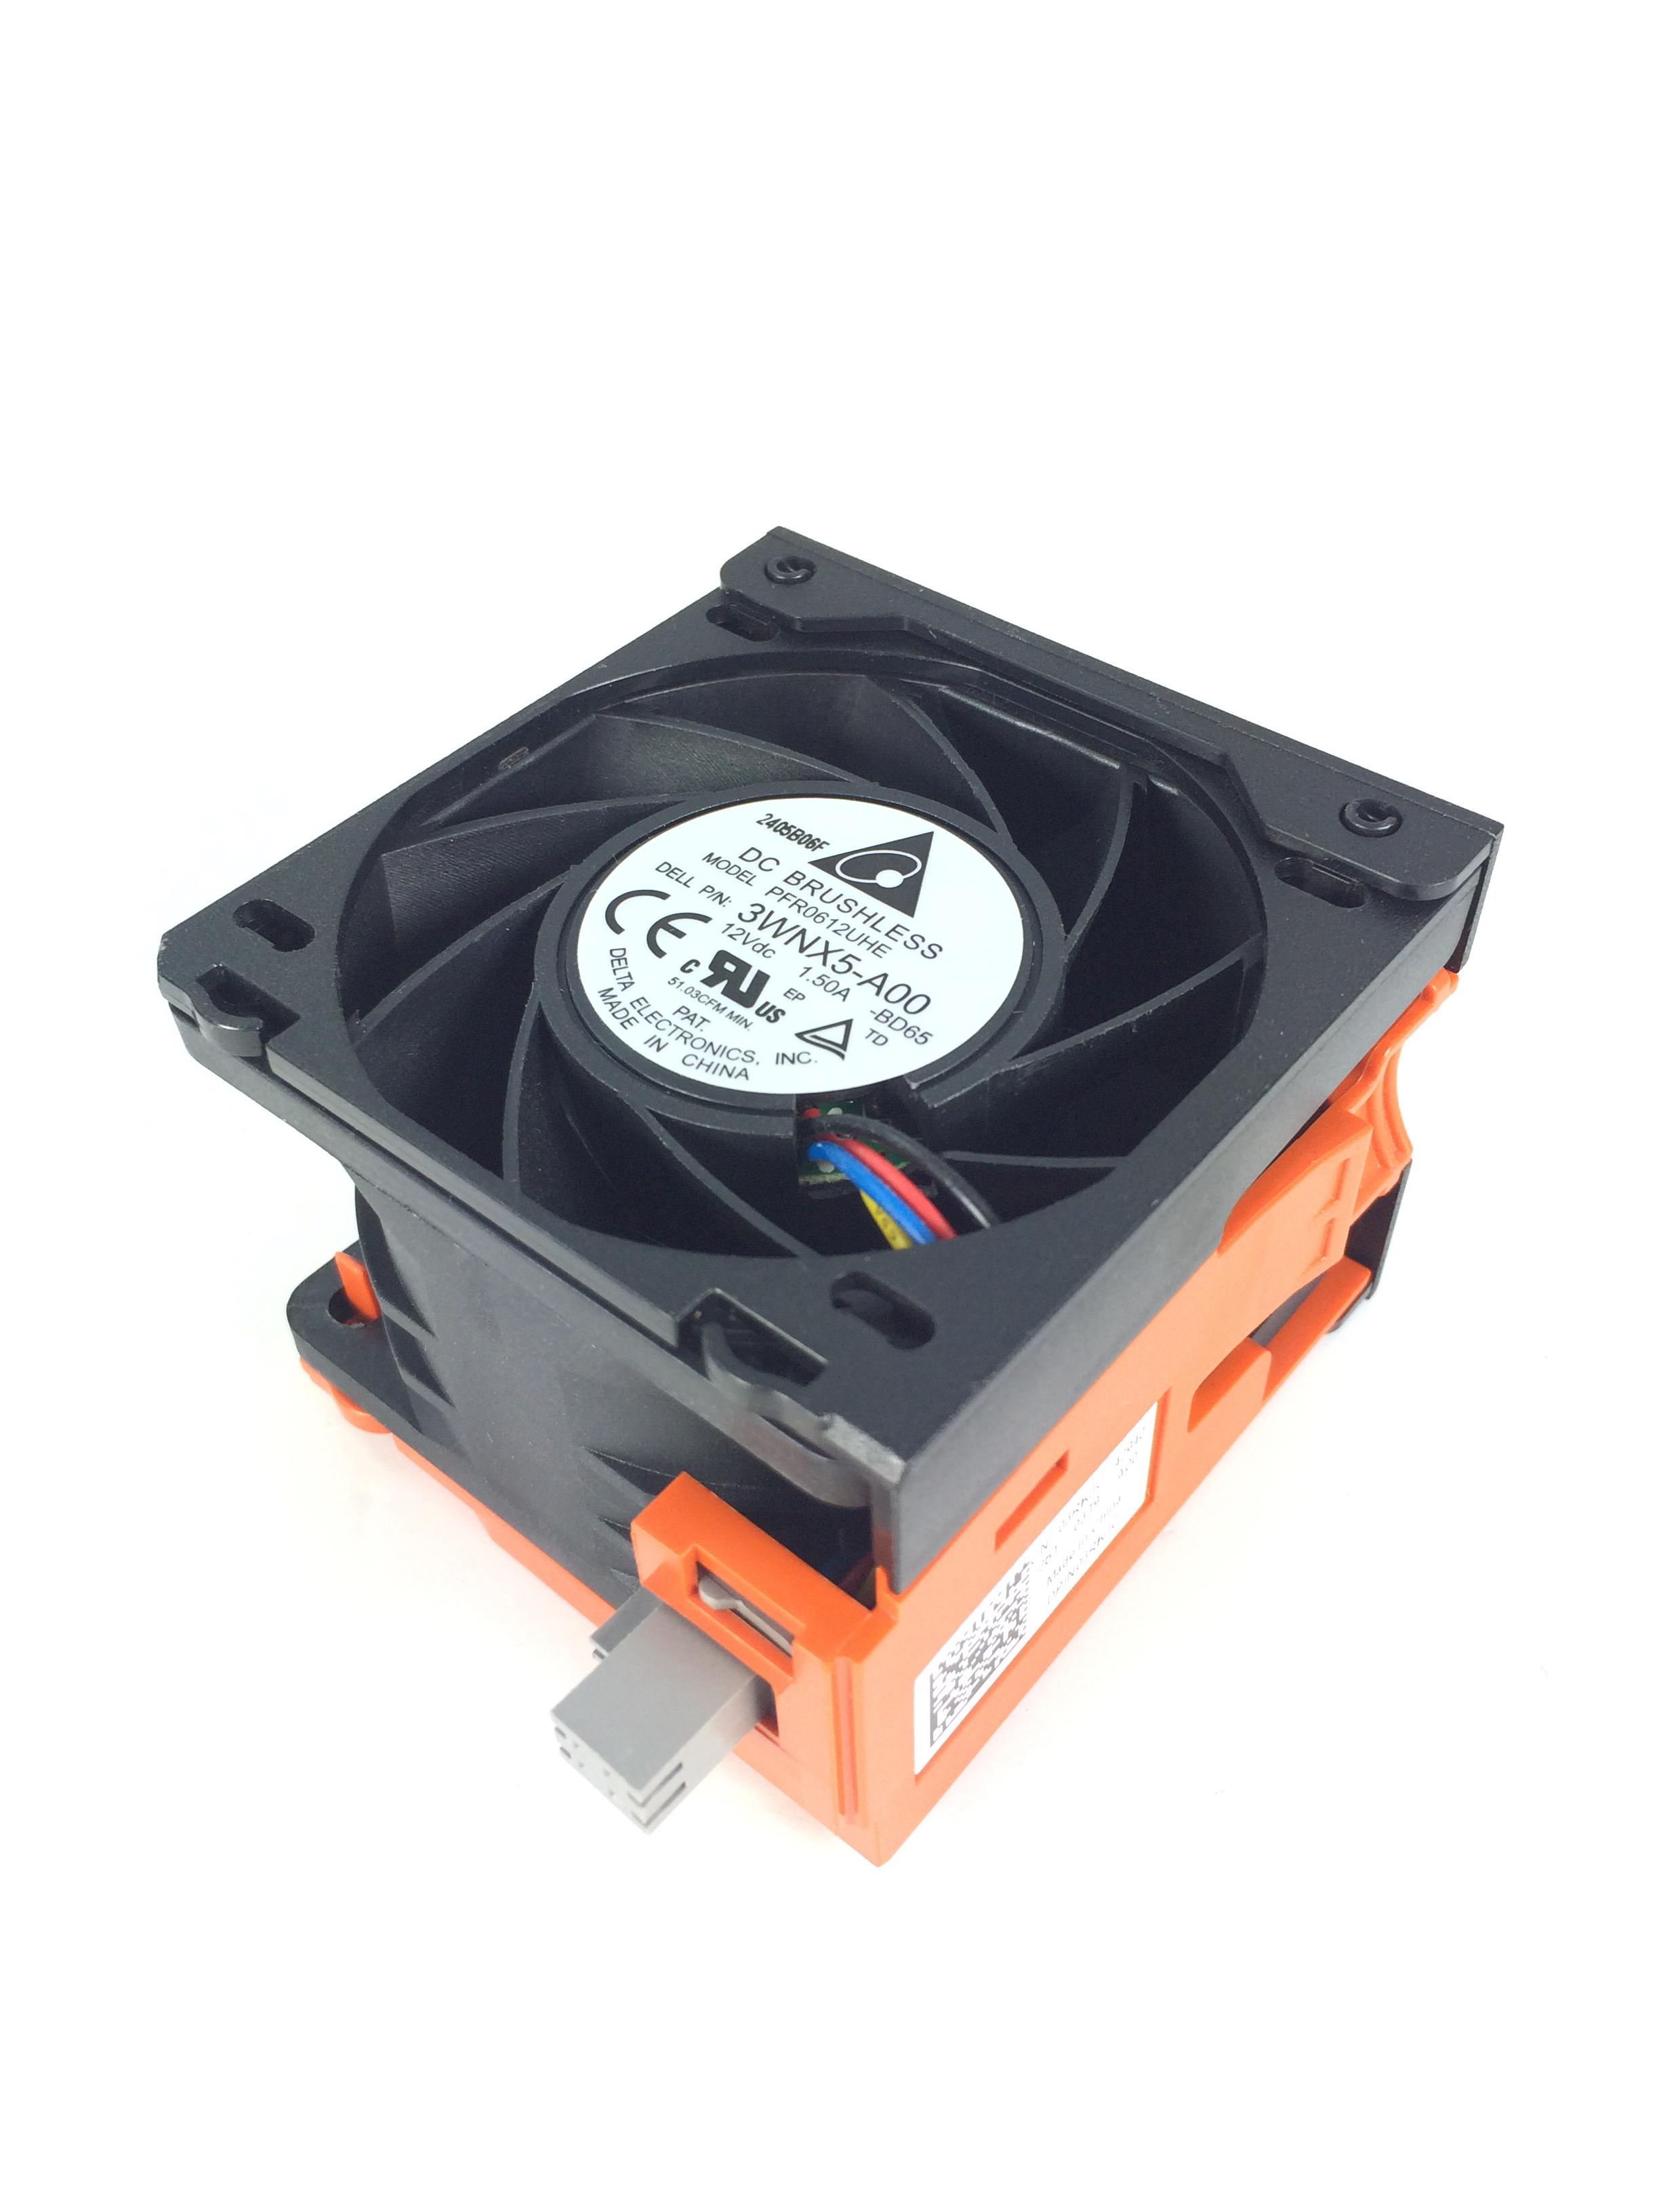 Dell PowerEdge R720 R720Xd Sc8000 Hot Swap CPU Cooling Fan (3RKJC)